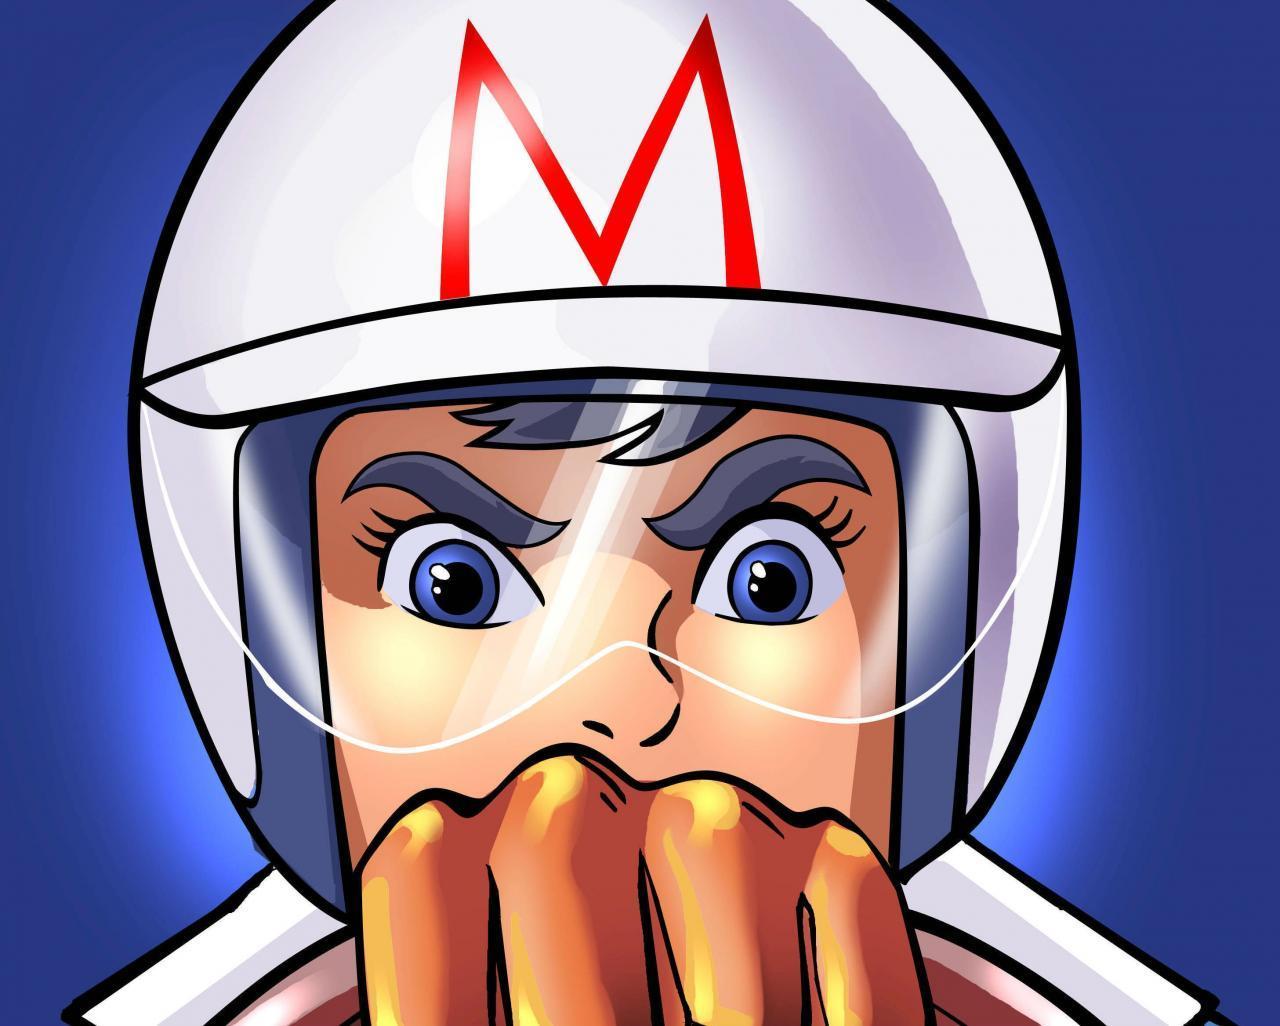 Speed-Racer-picture_convert_20200106192703.jpg